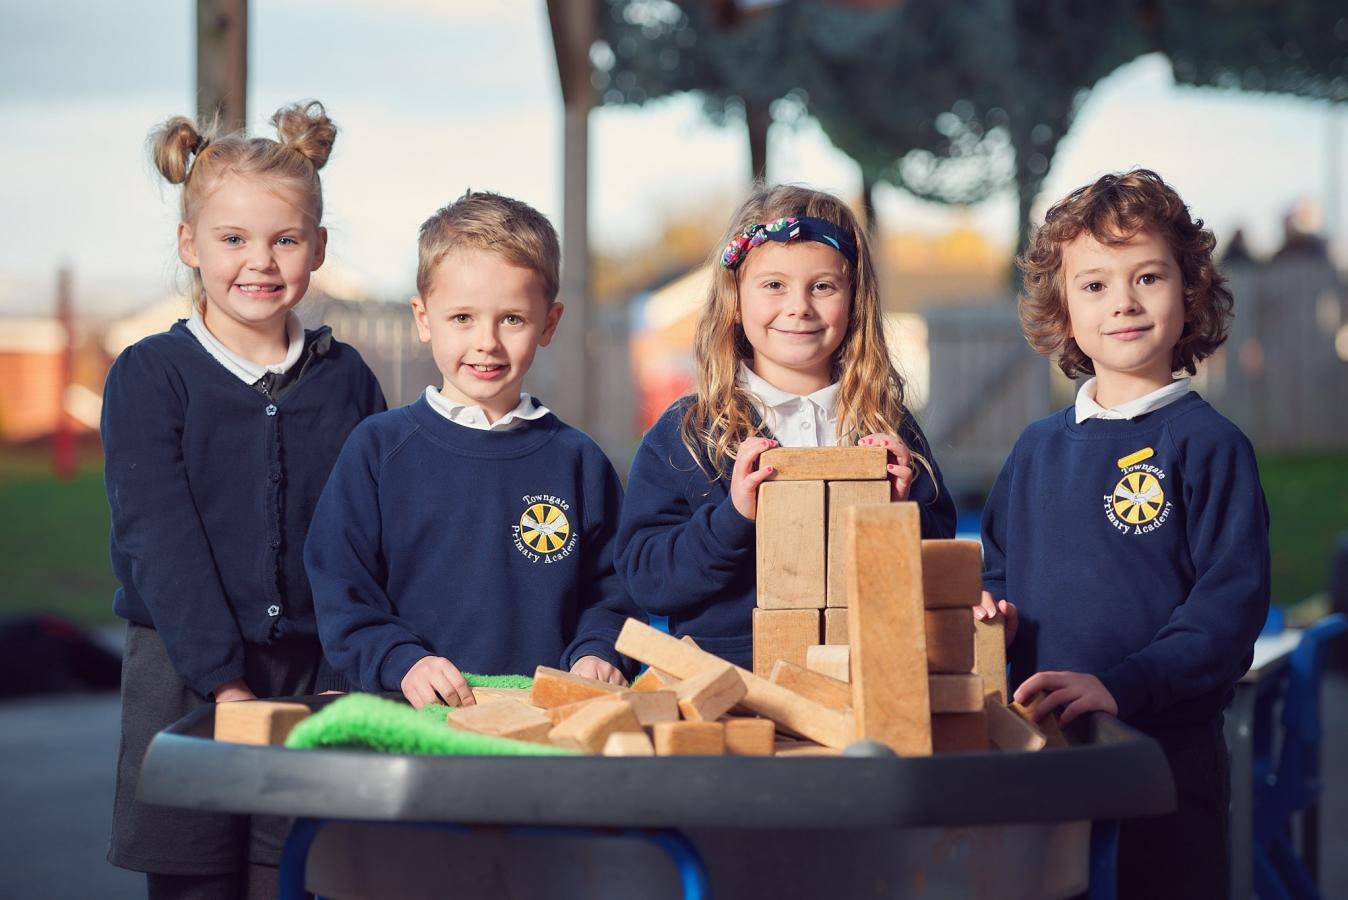 Towngate pupils